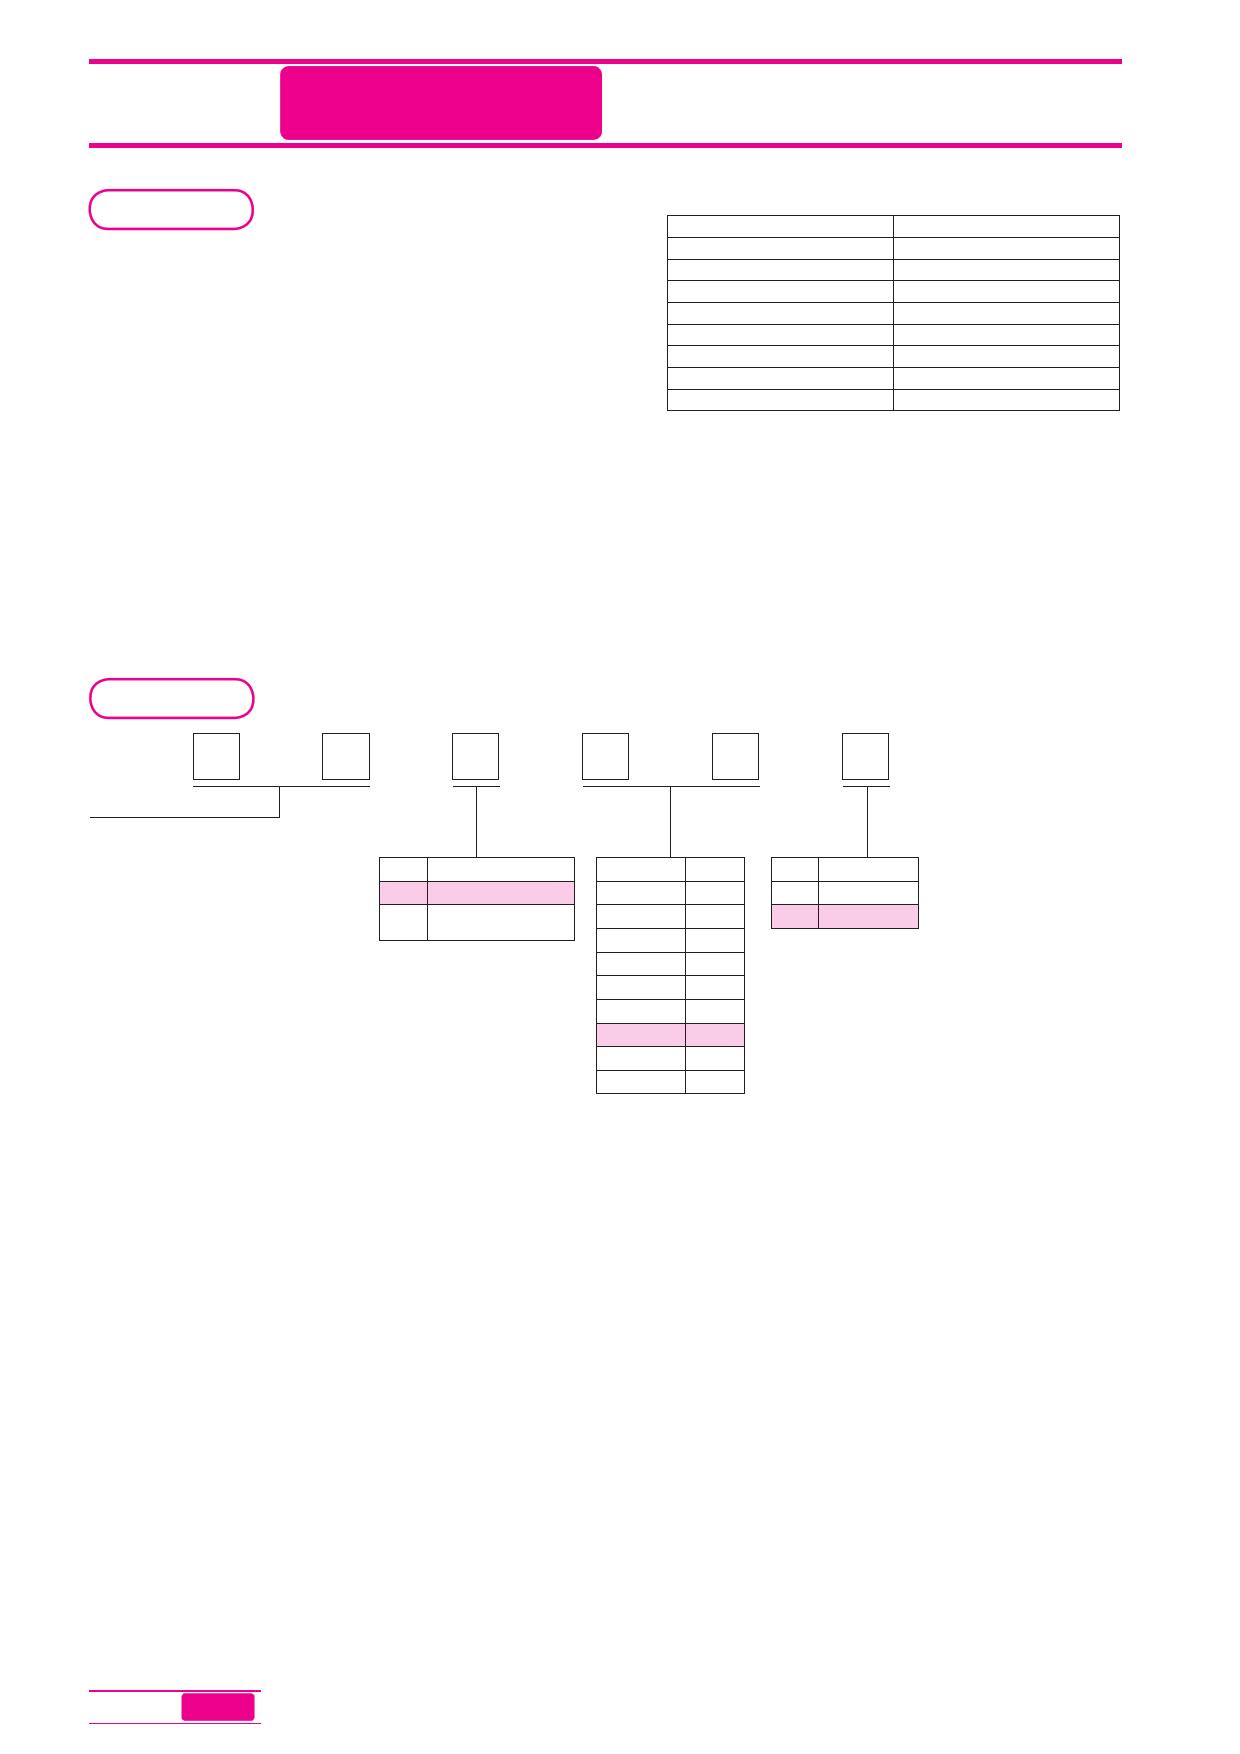 KSP102 datasheet